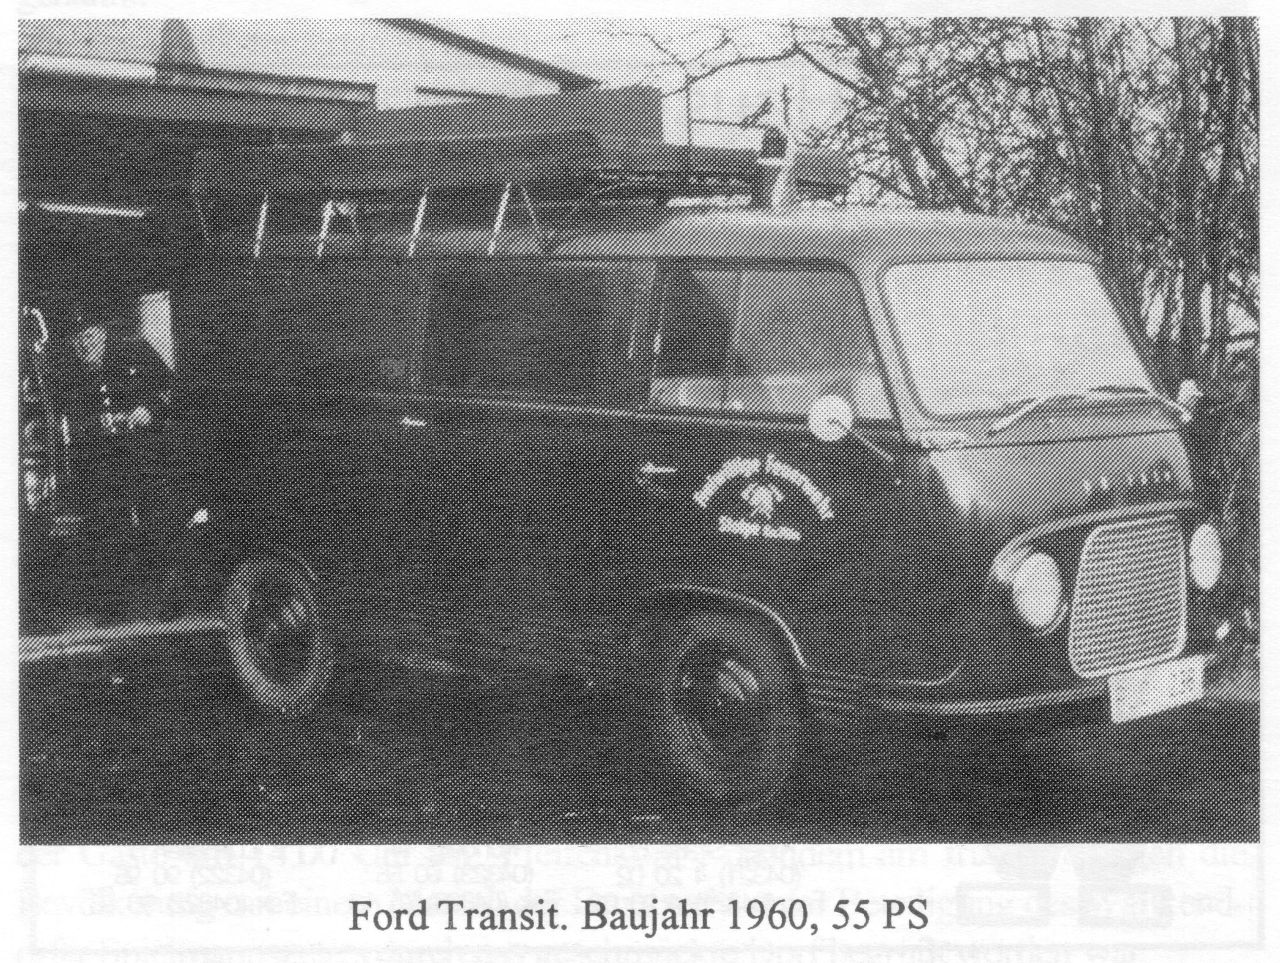 Ford Transit 1960